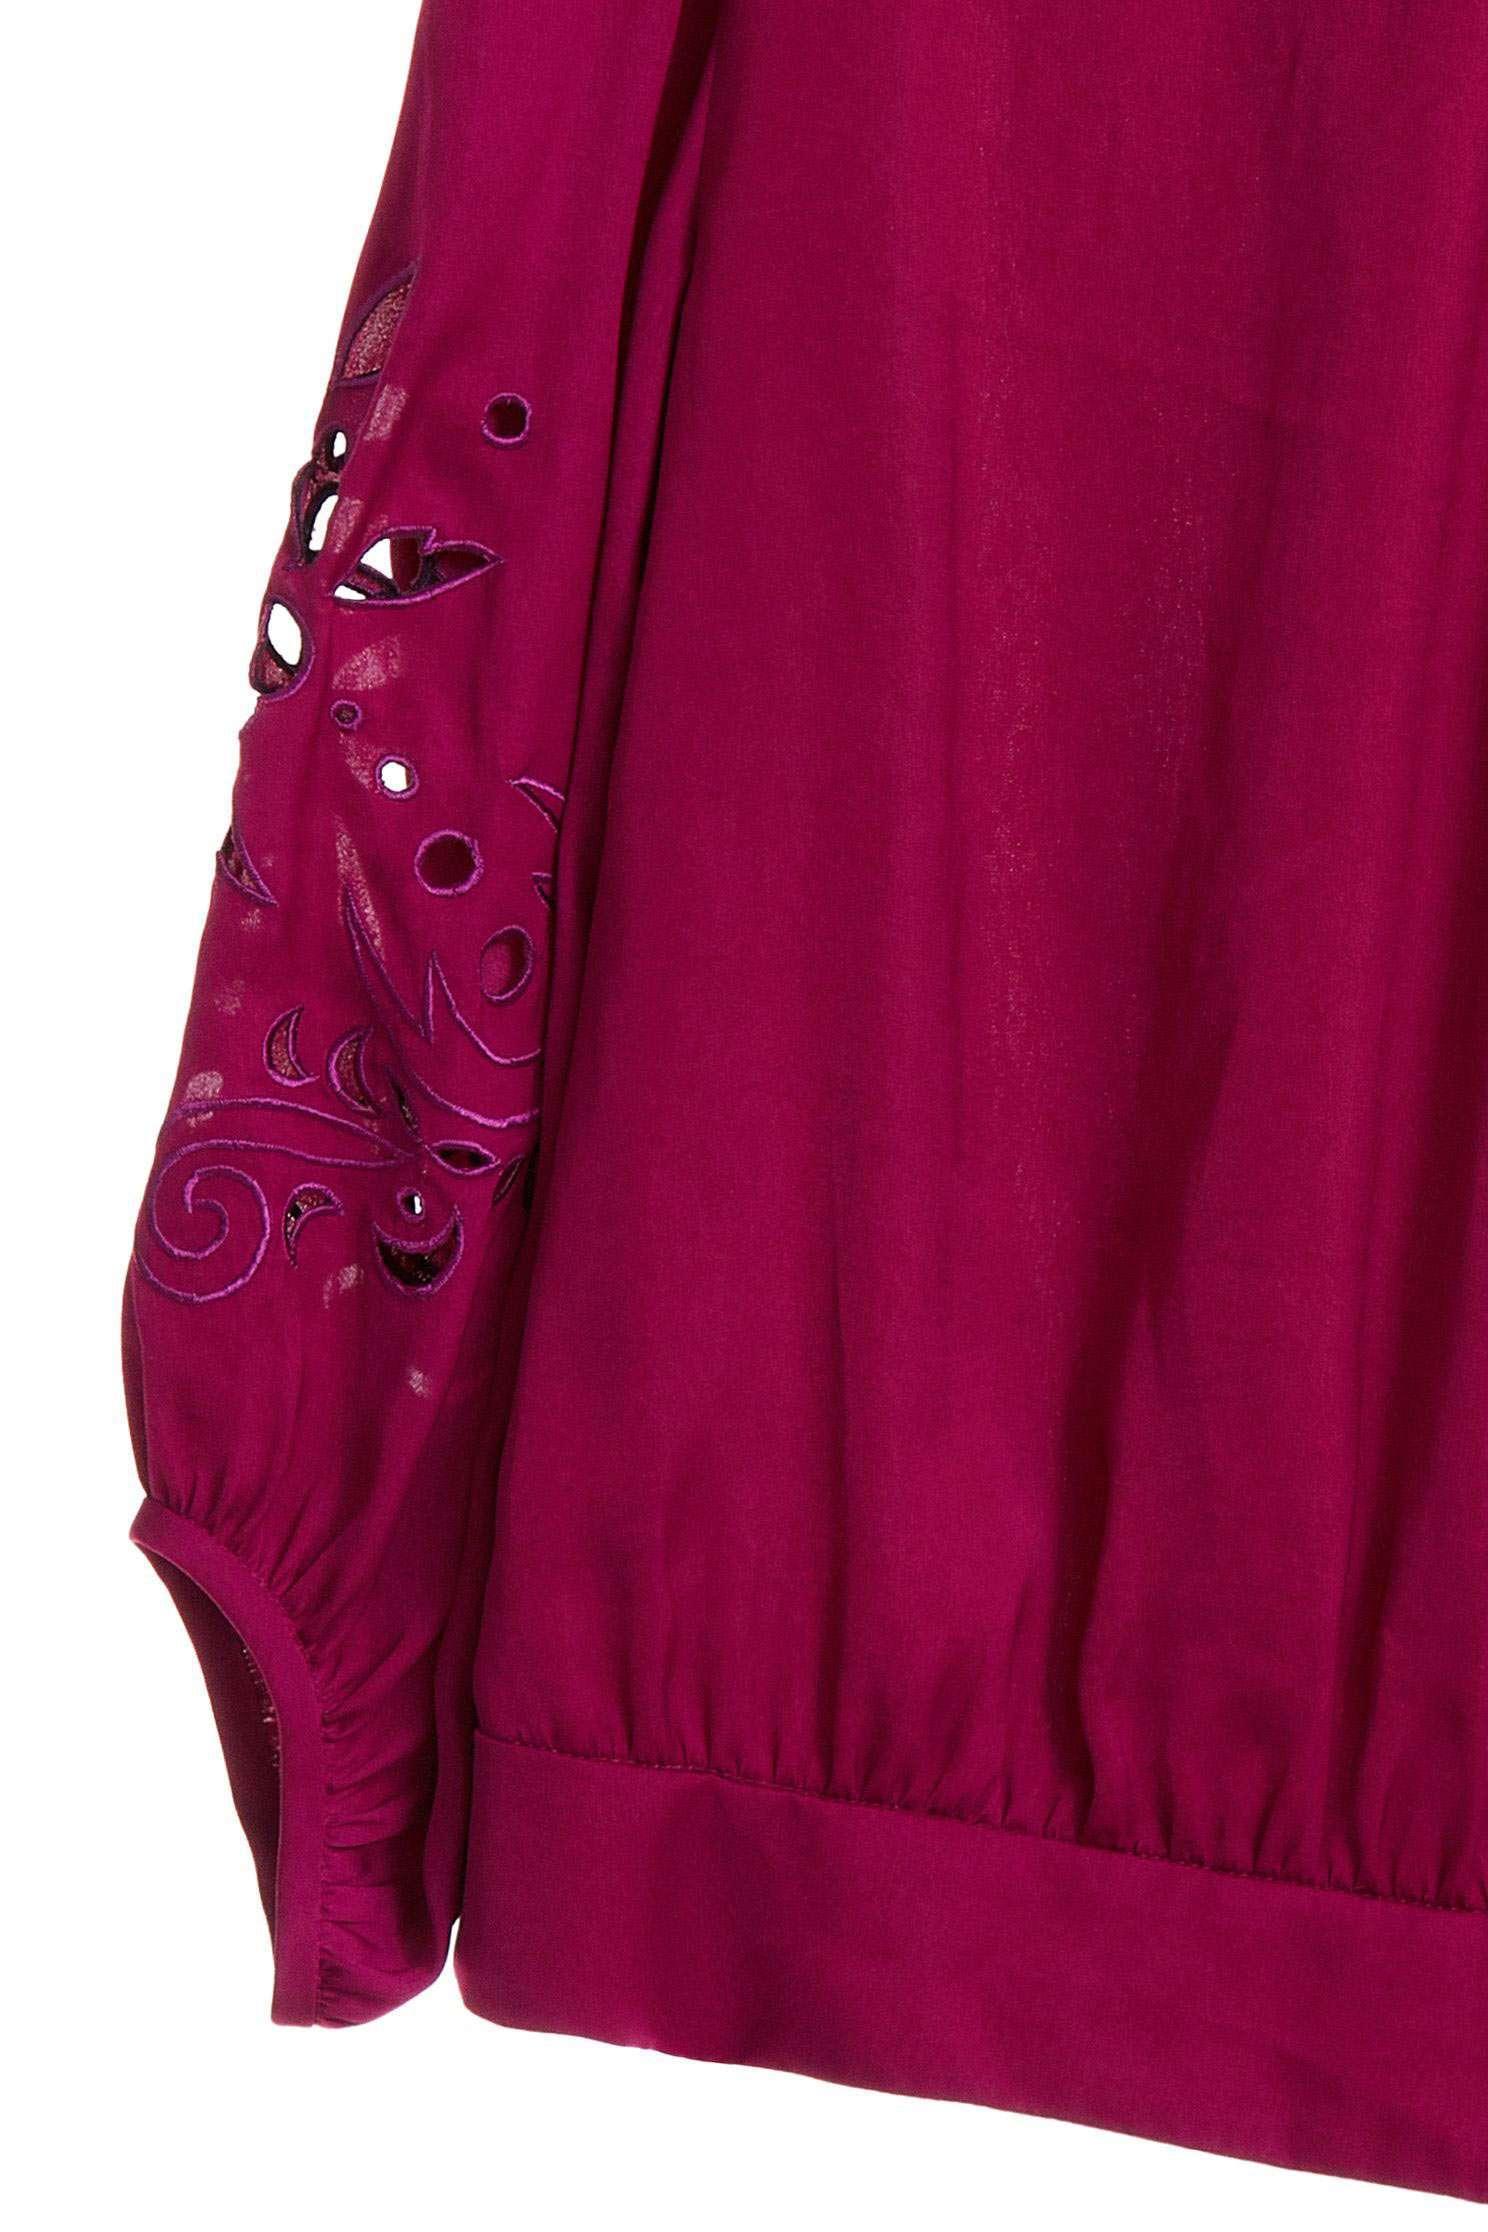 Hollowed graceful top,Top,embroidery,刺繡上衣,簍空上衣,embroidered,繡花上衣,長袖上衣